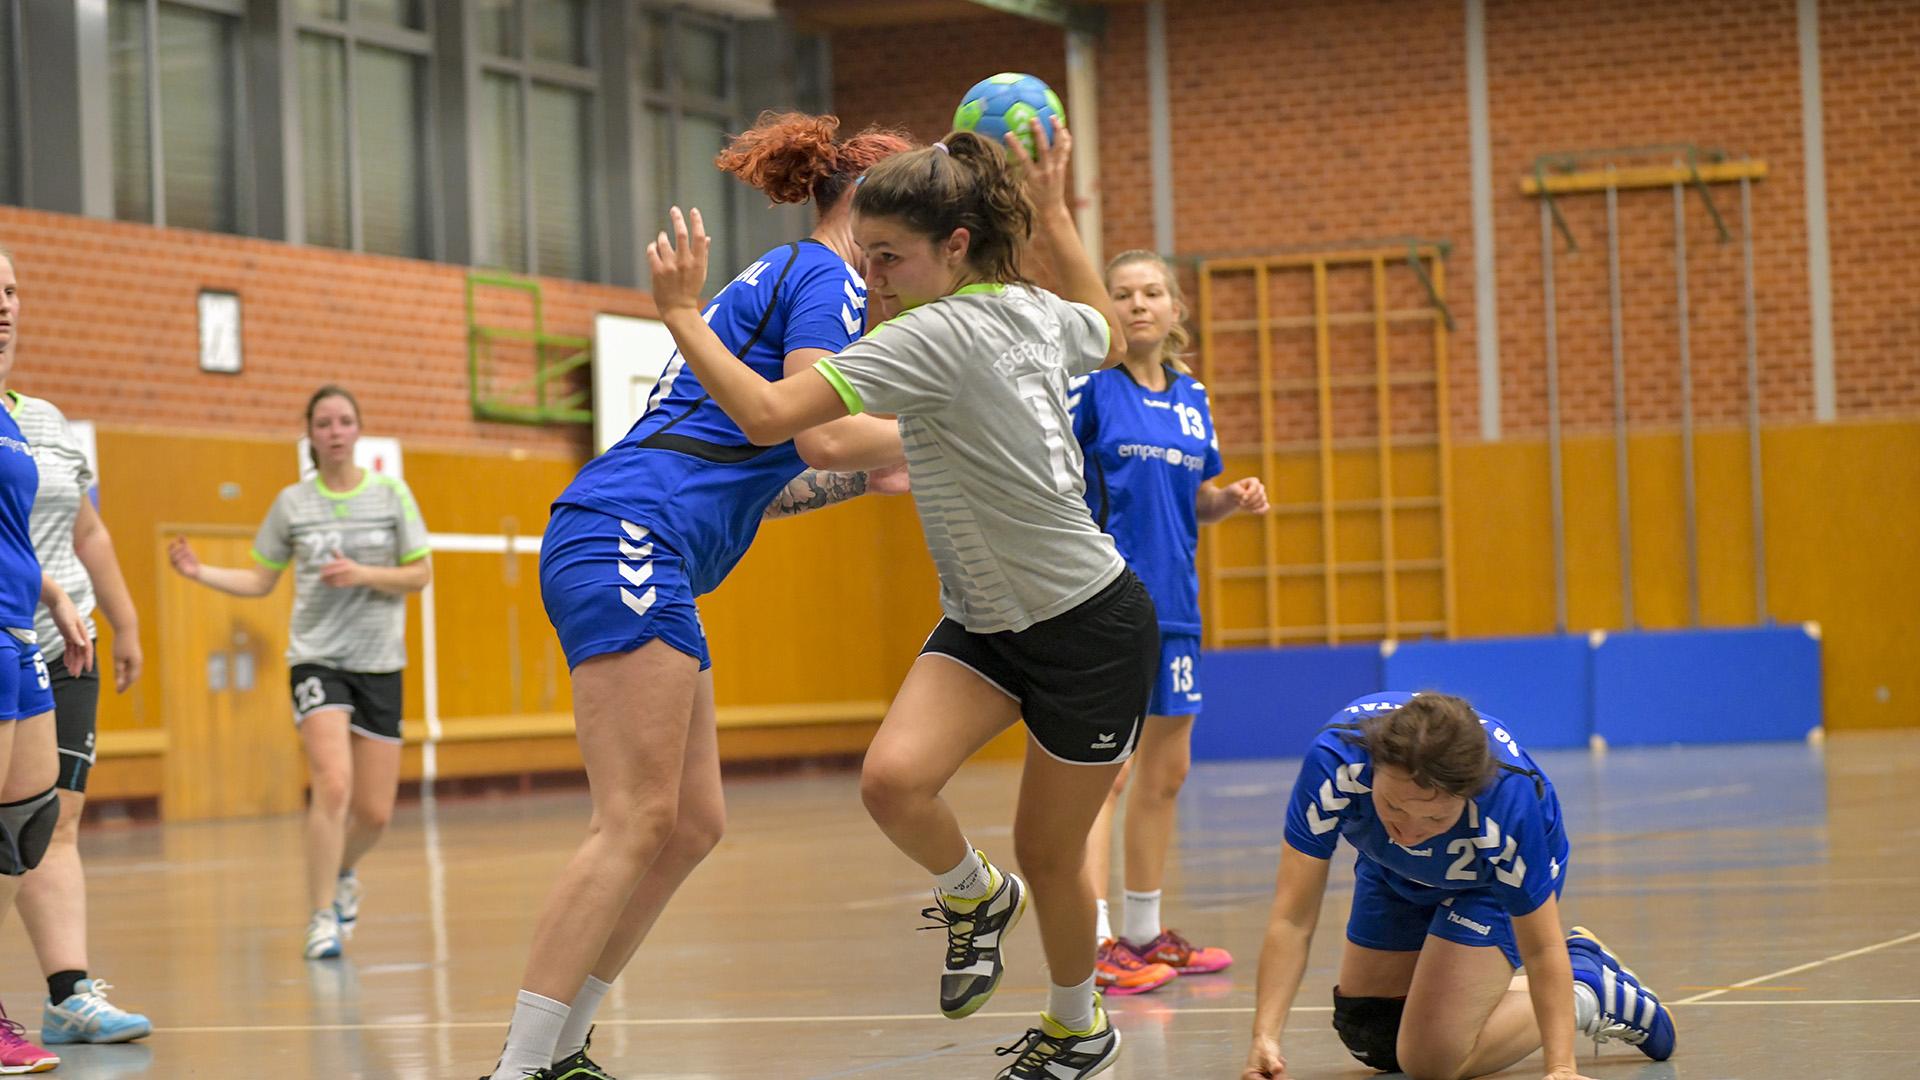 003Slider_Damen_tsg_leutkirch_handball